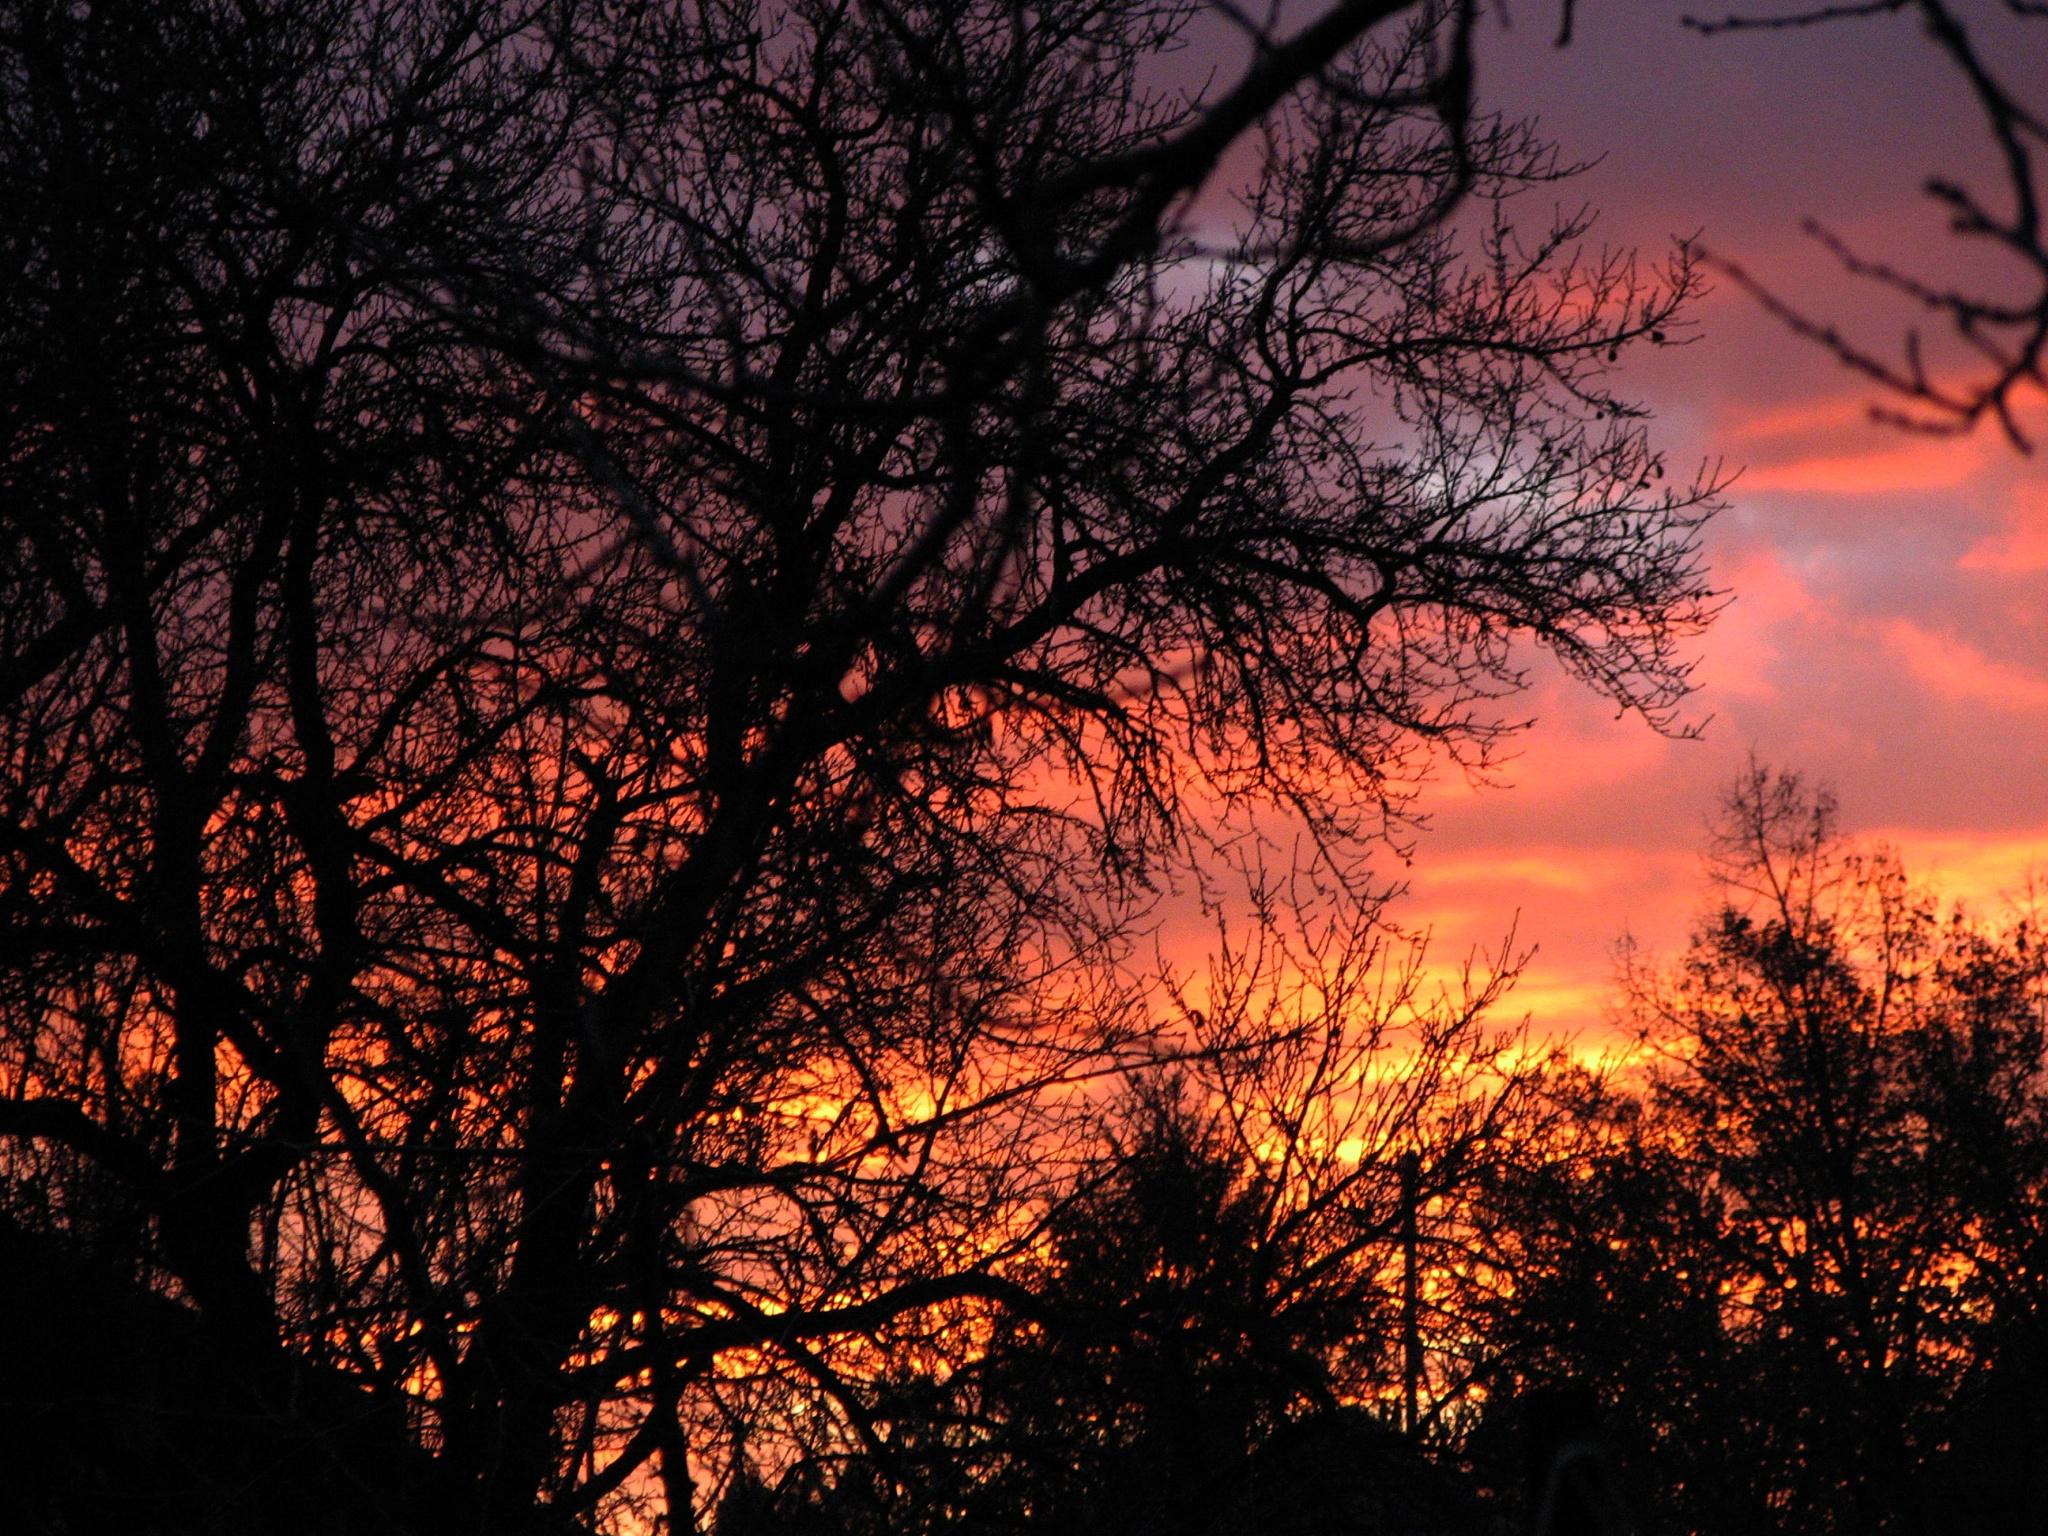 November sunset by natasakljukevic